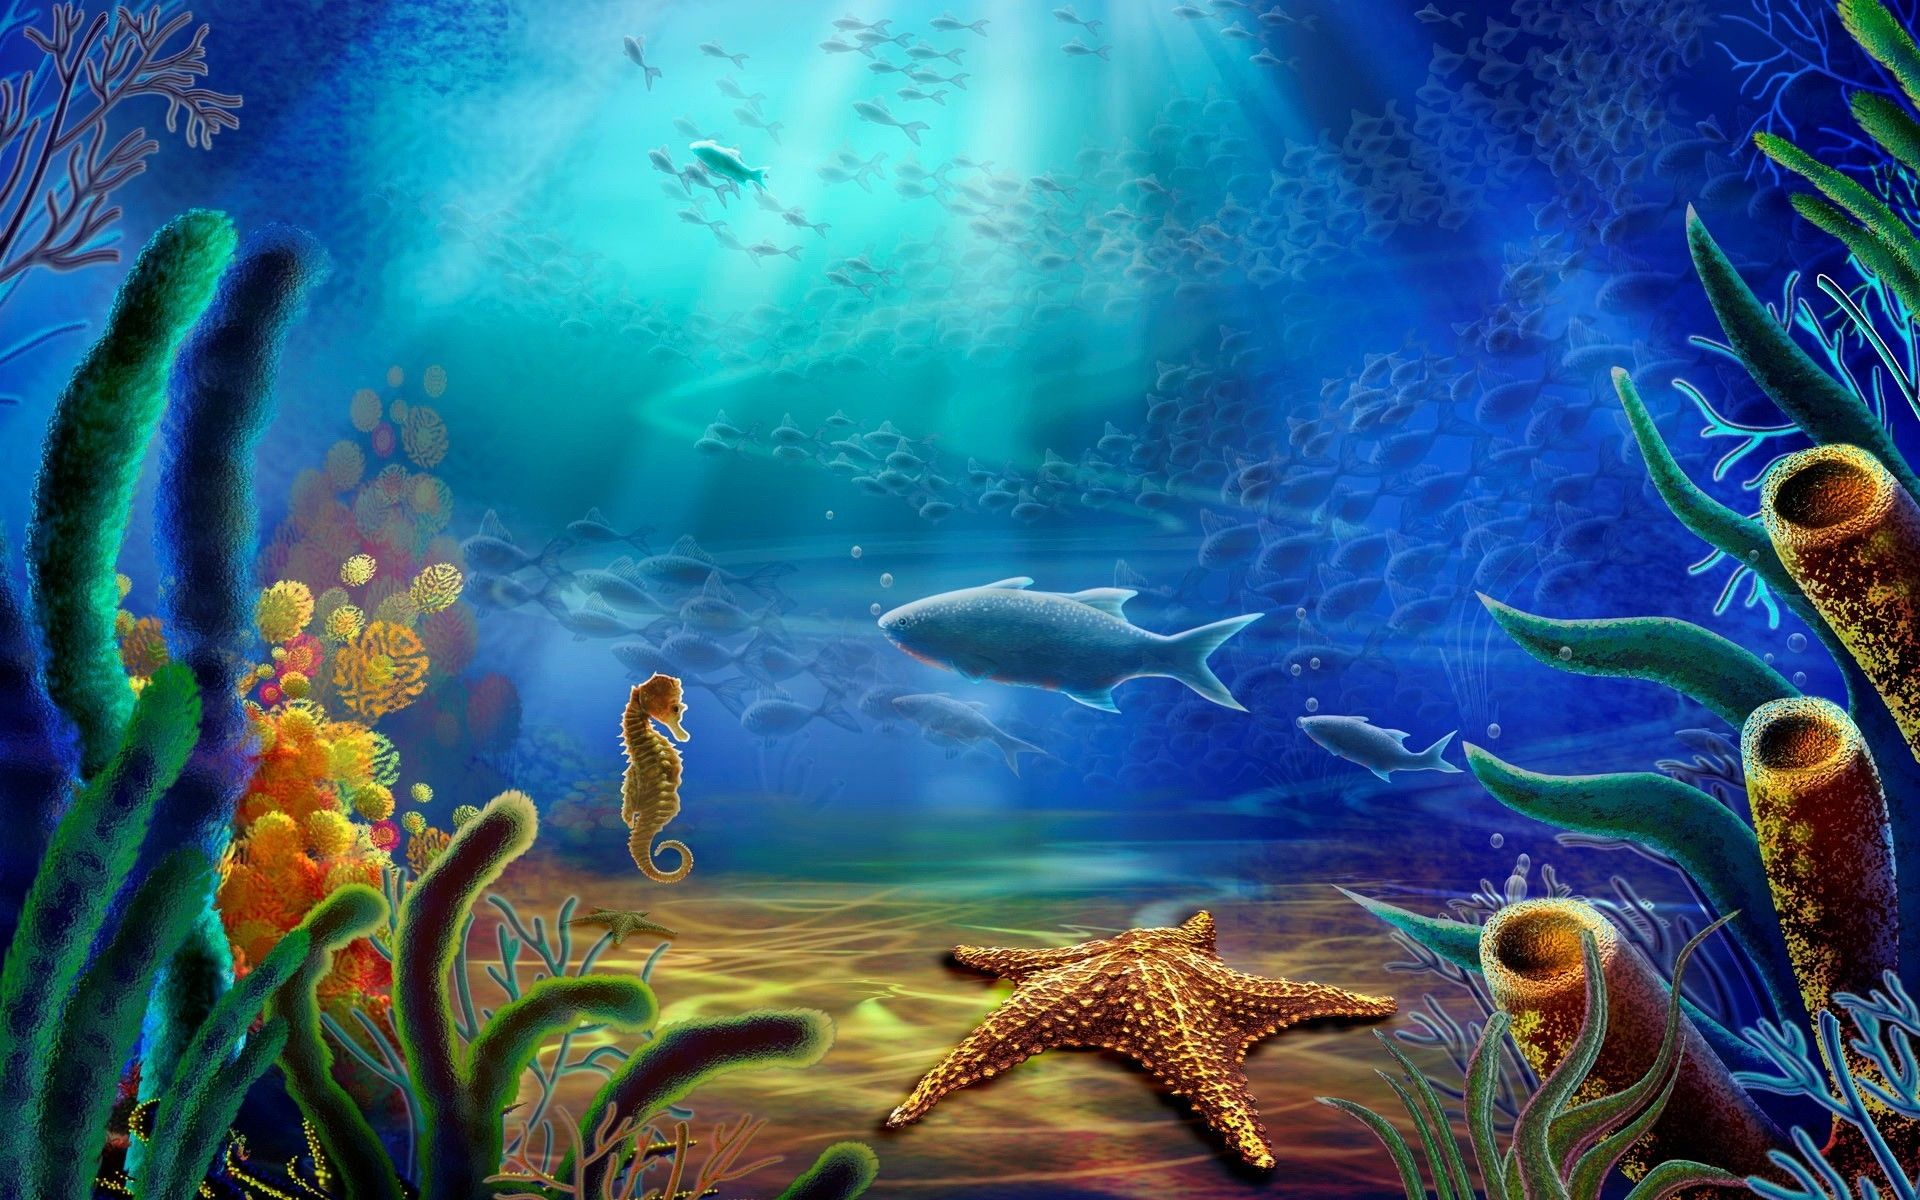 Undersea Life | Artistic, wallpaper, life, marine, wallpapers - 612797 | Magic Potion Book ...